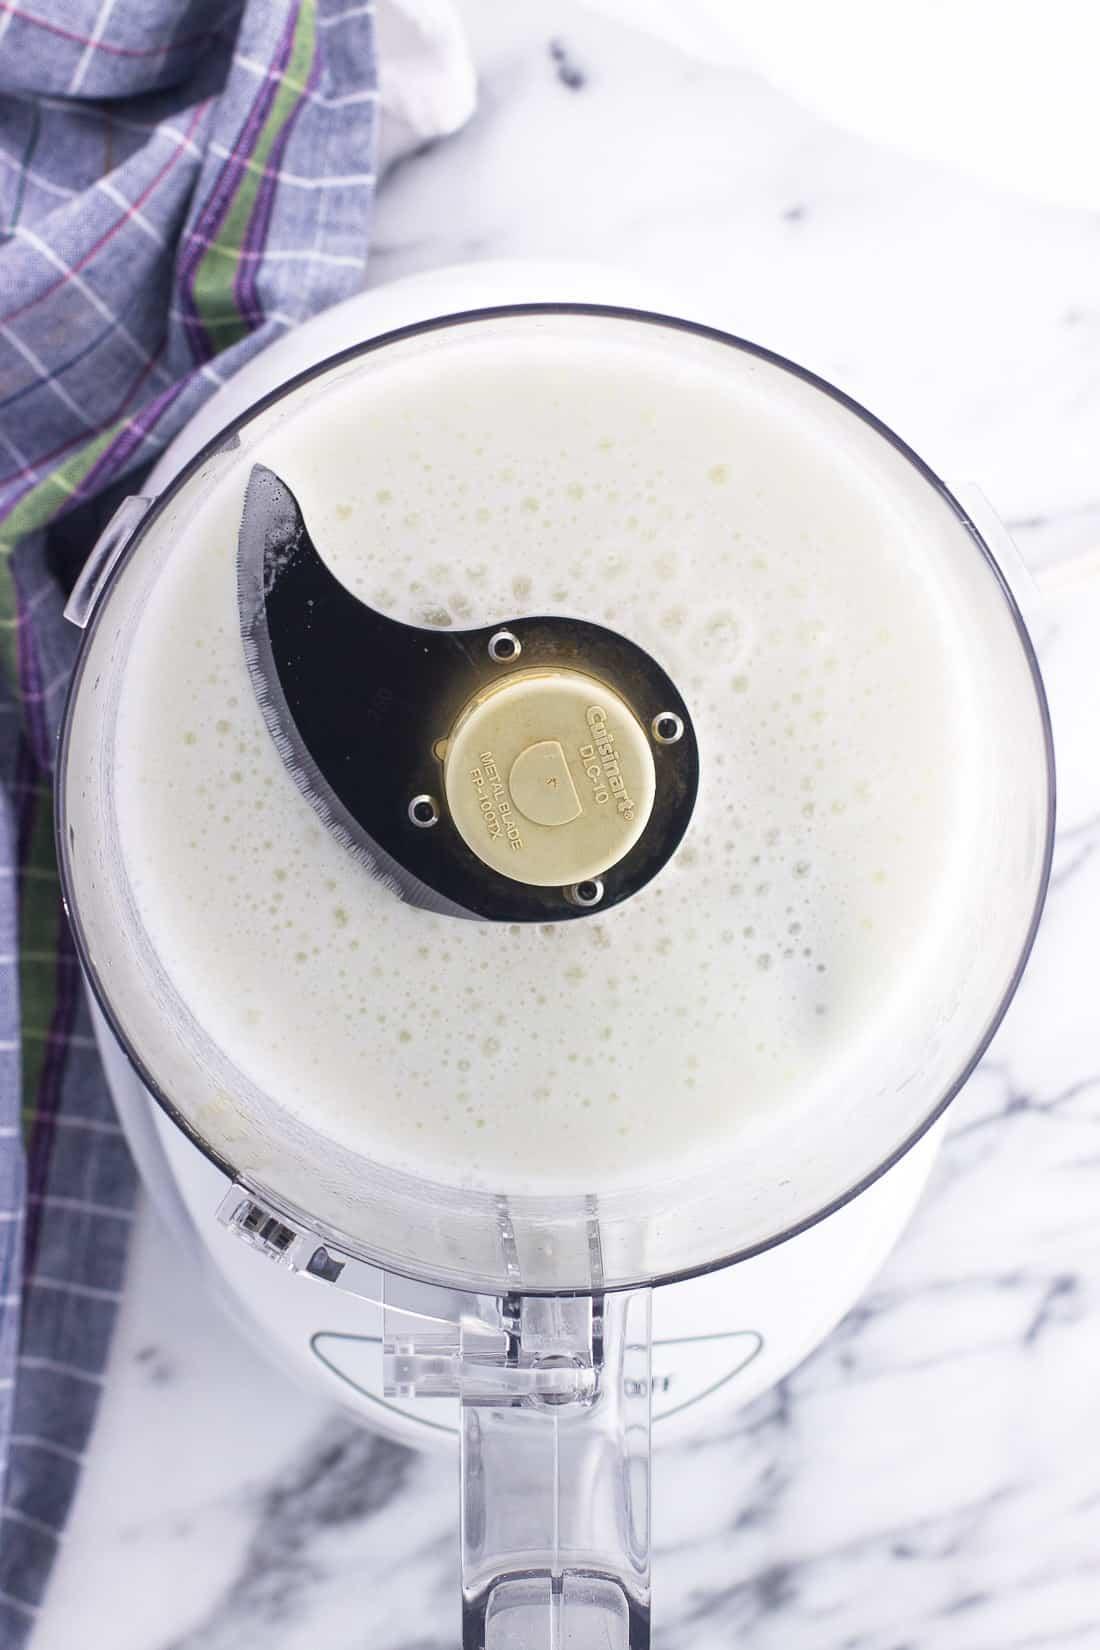 Foamy egg whites in a food processor